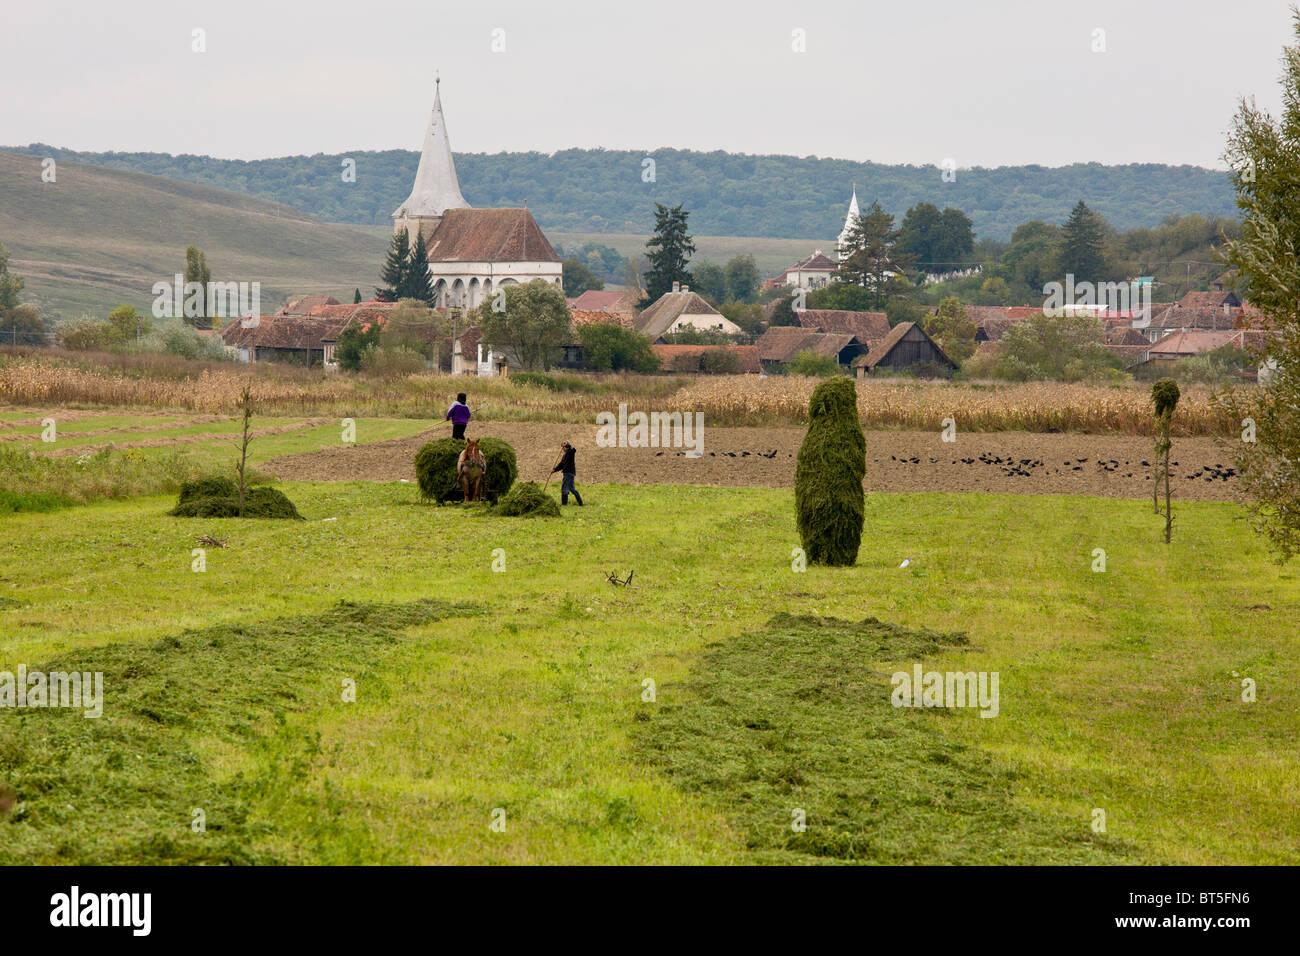 Hay collection by the saxon village of Soars, Transylvania, Romania - Stock Image